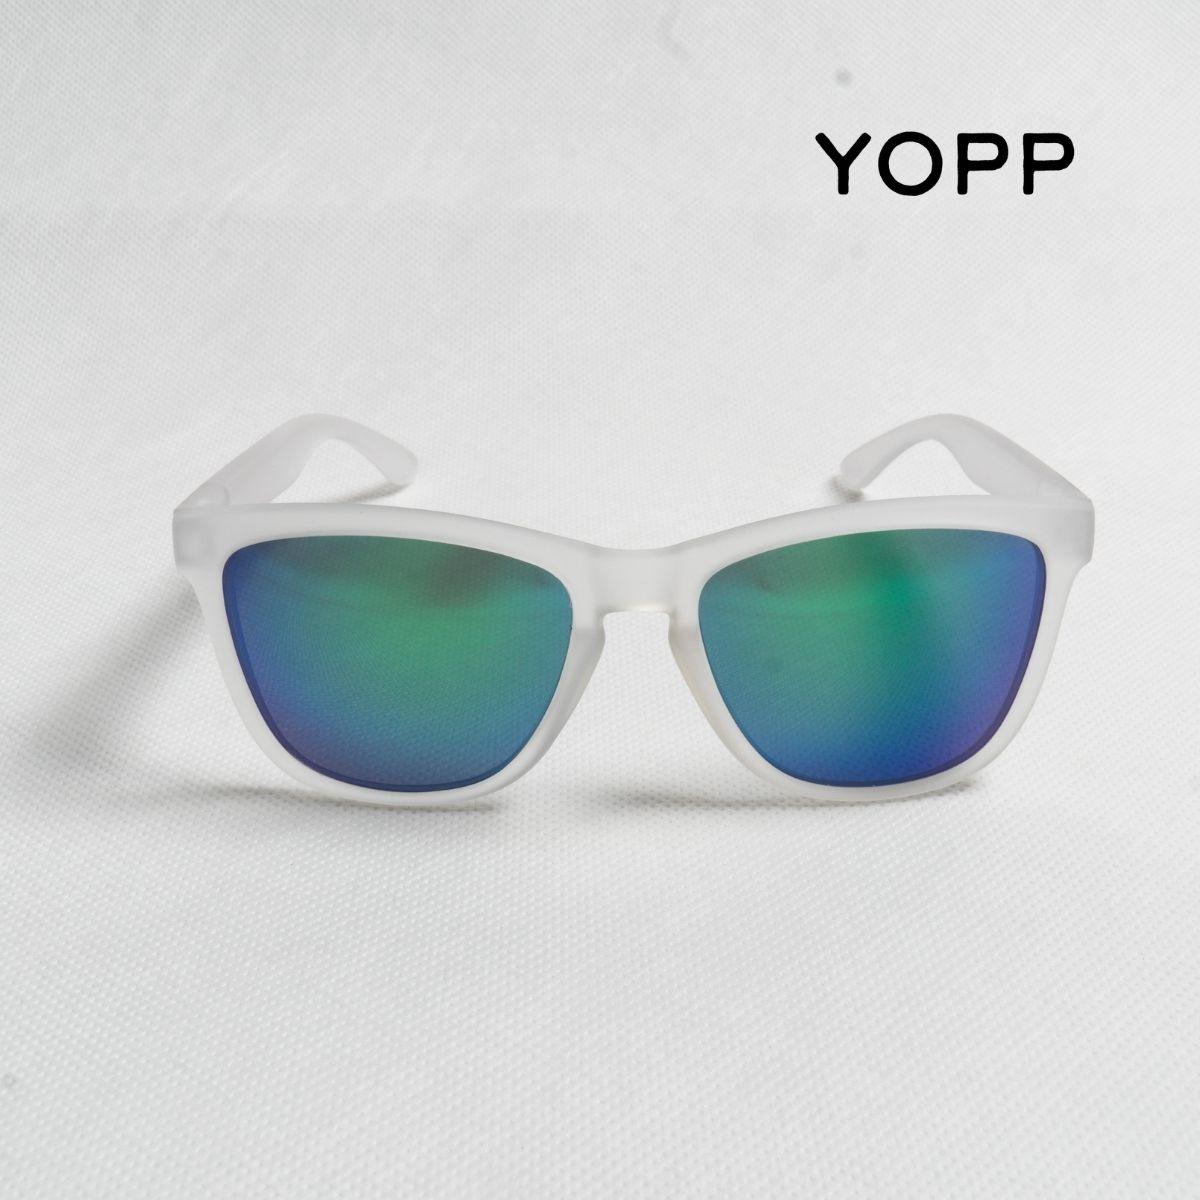 Óculos YOPP AVANTI  - Vivian Bógus